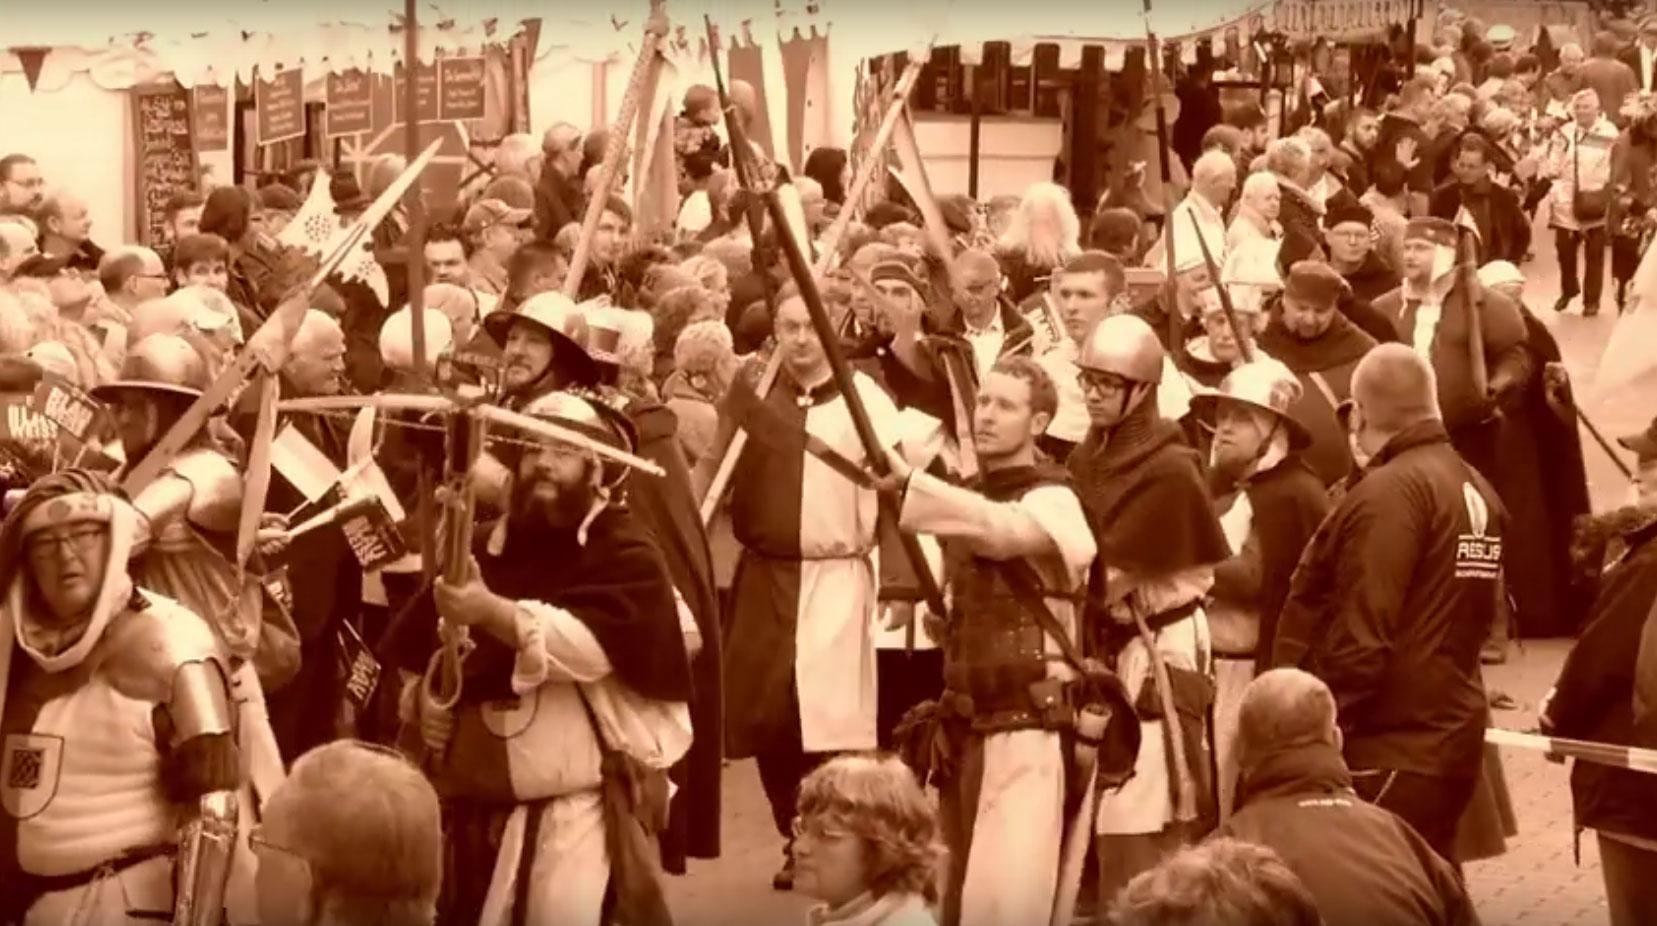 632. Bochumer Maiabendfest